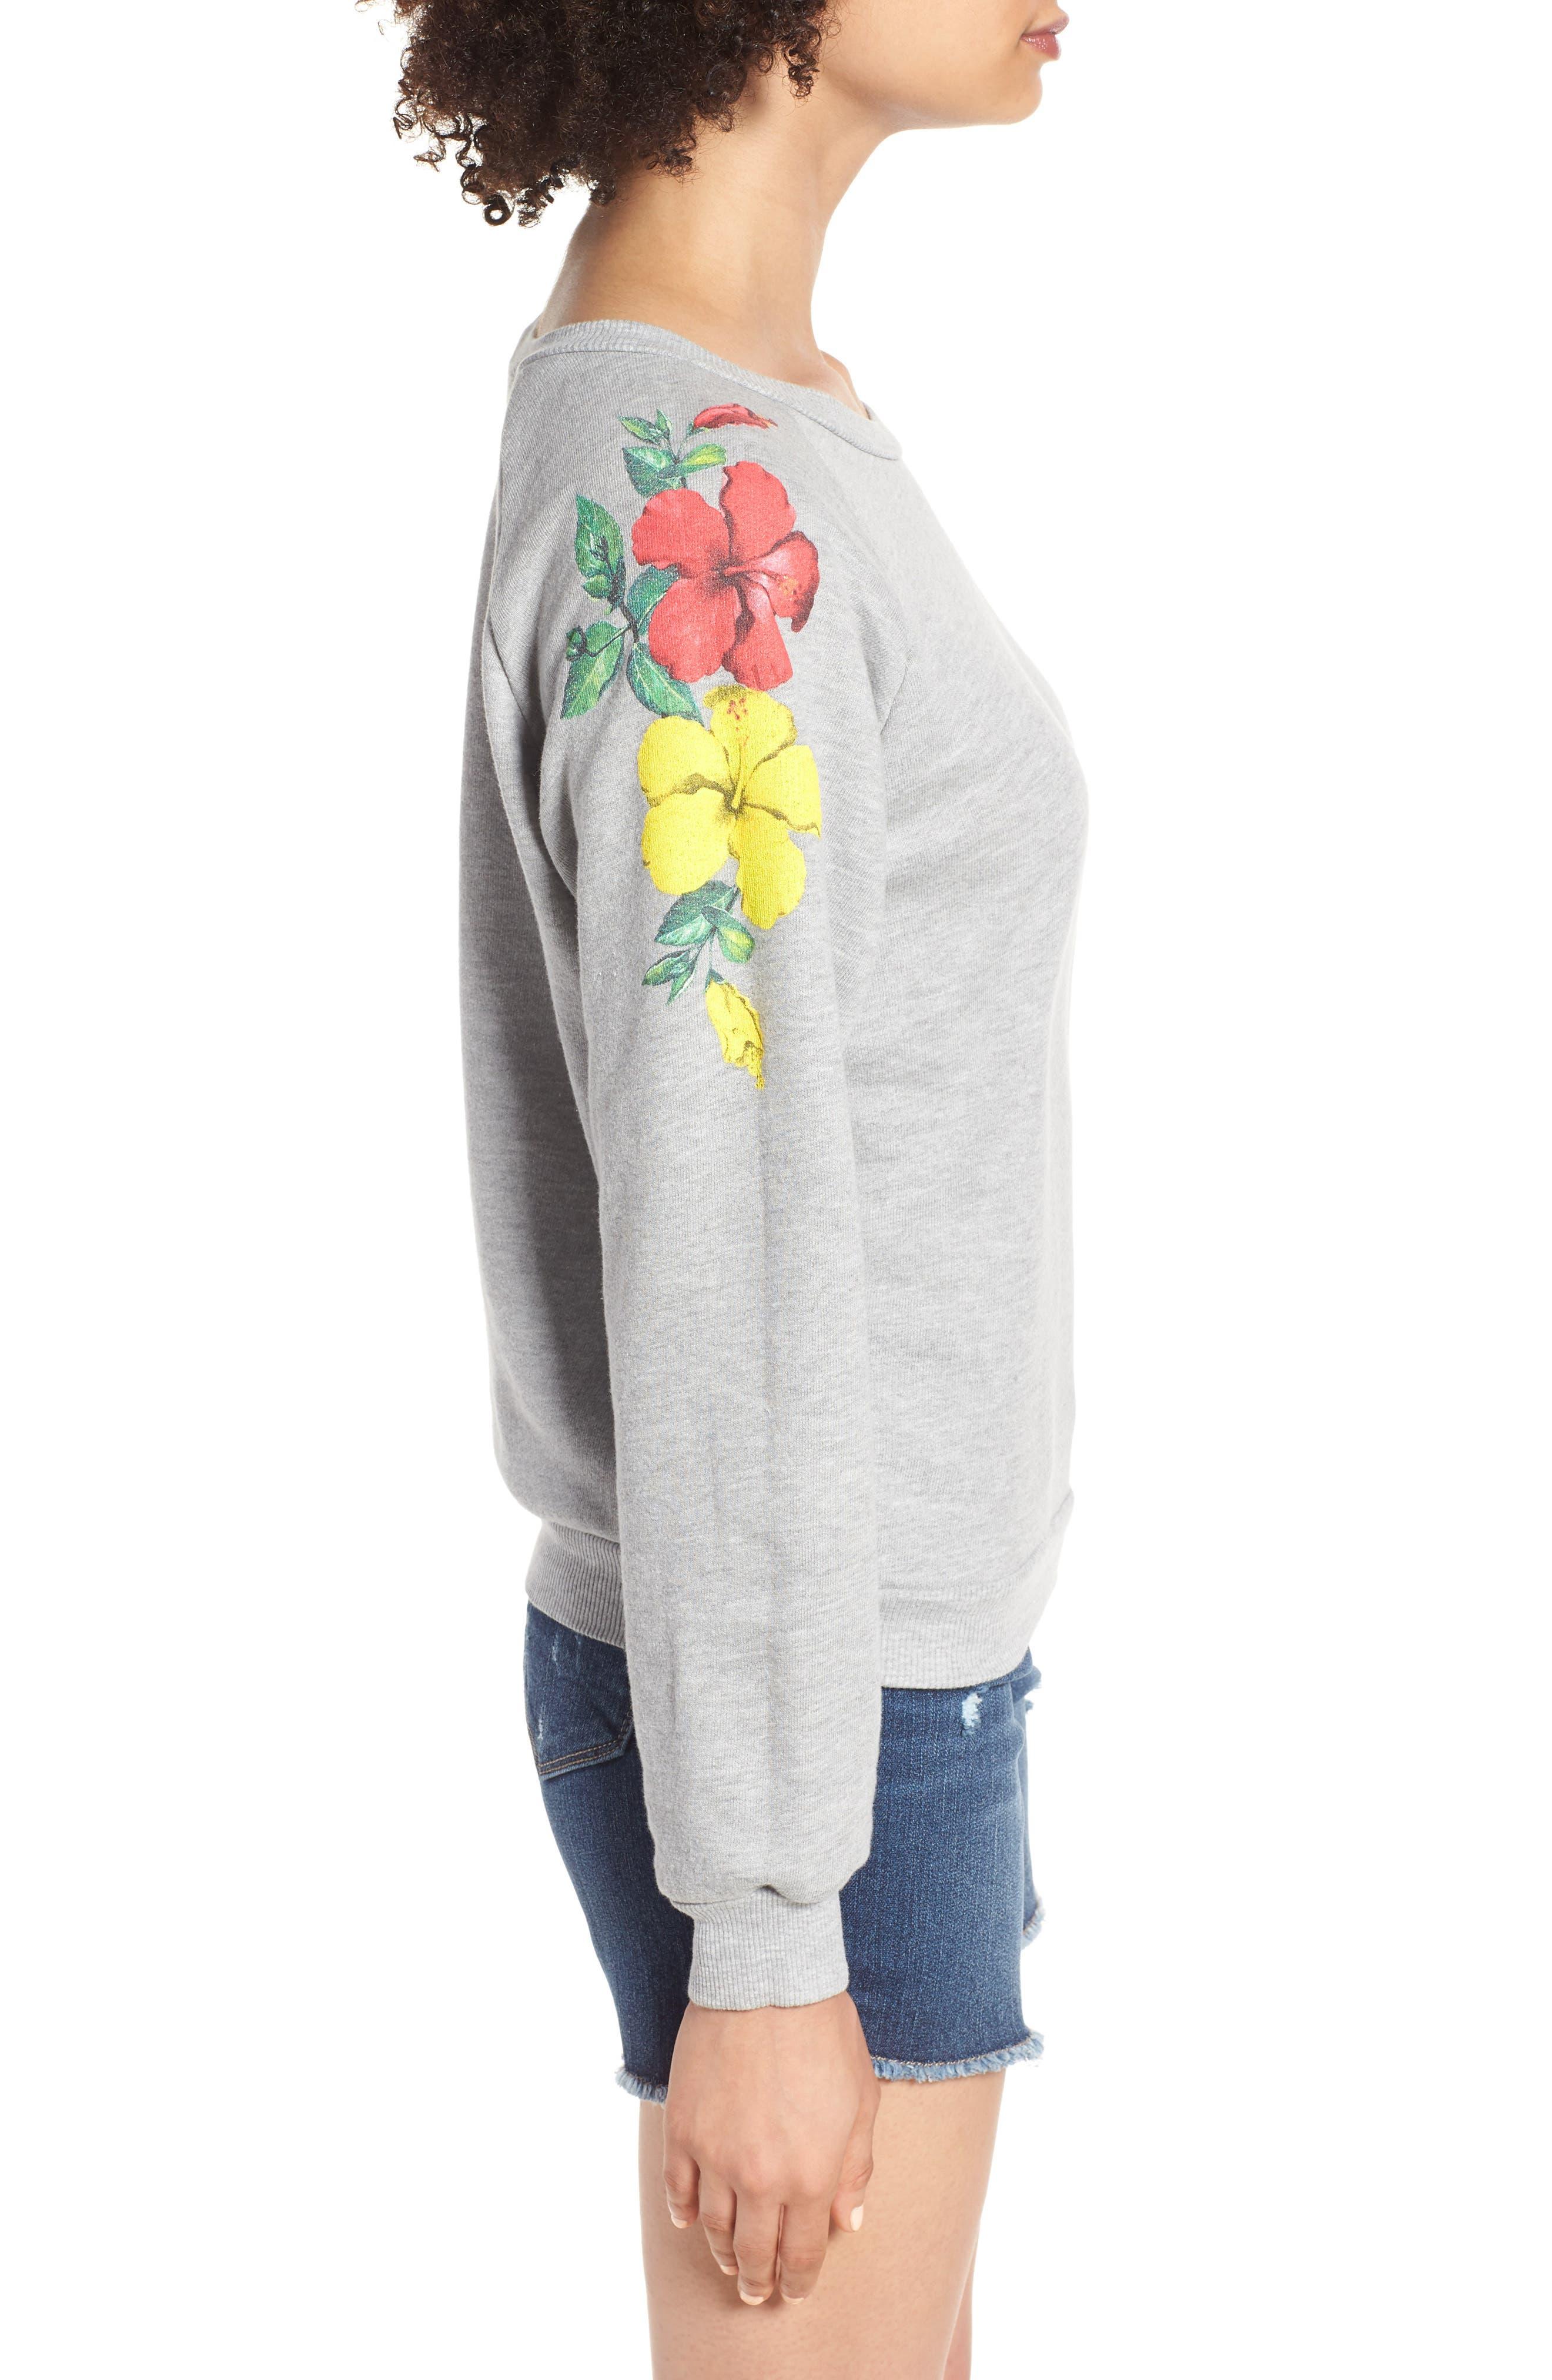 Hibiscus Junior Sweatshirt,                             Alternate thumbnail 3, color,                             020